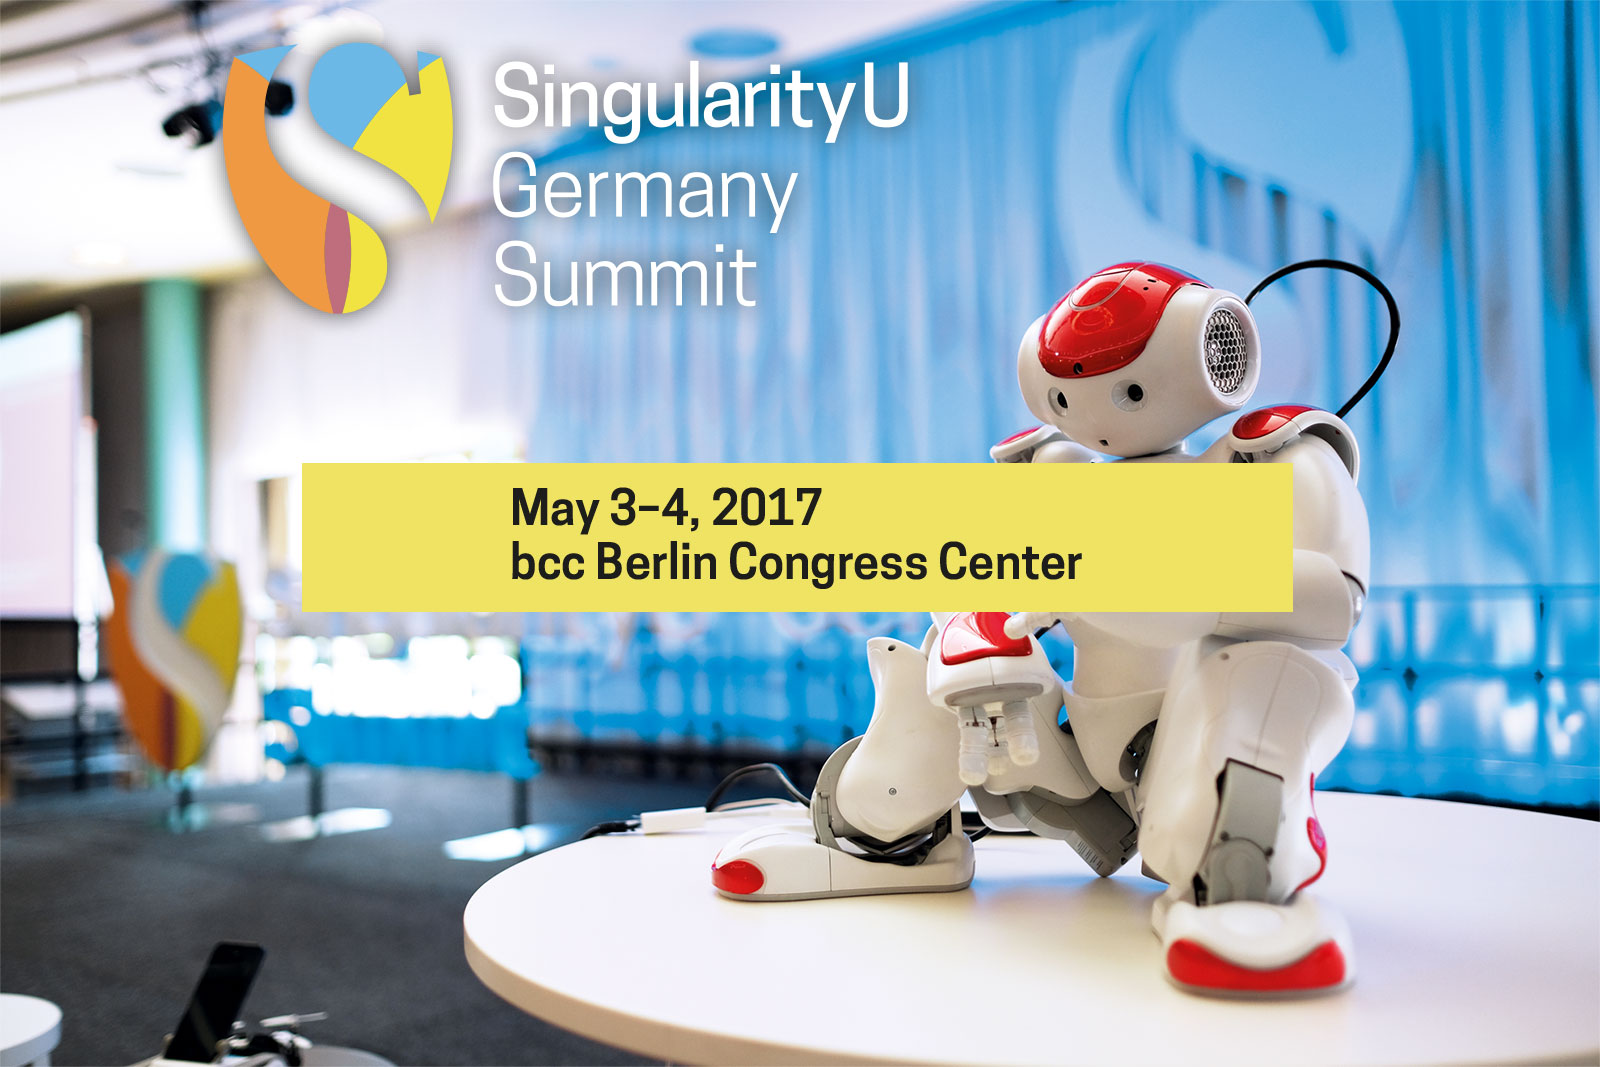 Visual_SU_Germany_Summit_2017